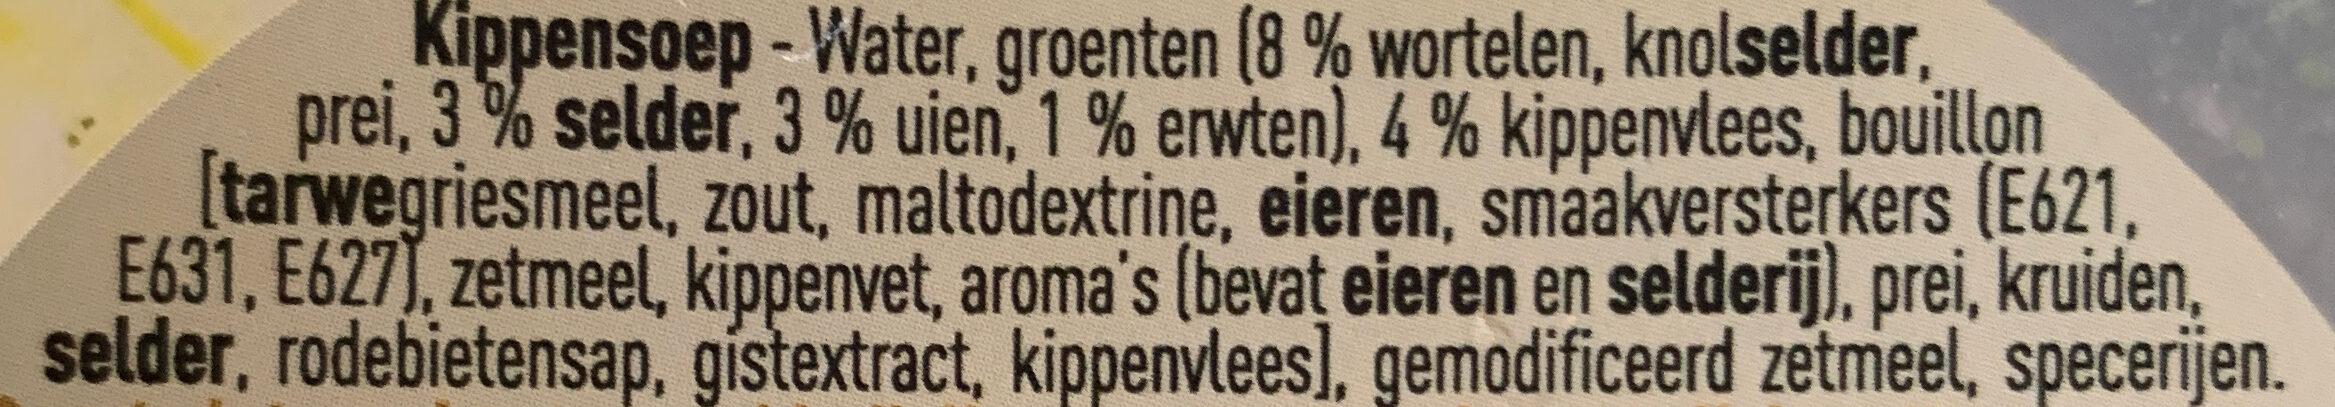 Soupe au poulet - Ingrediënten - nl